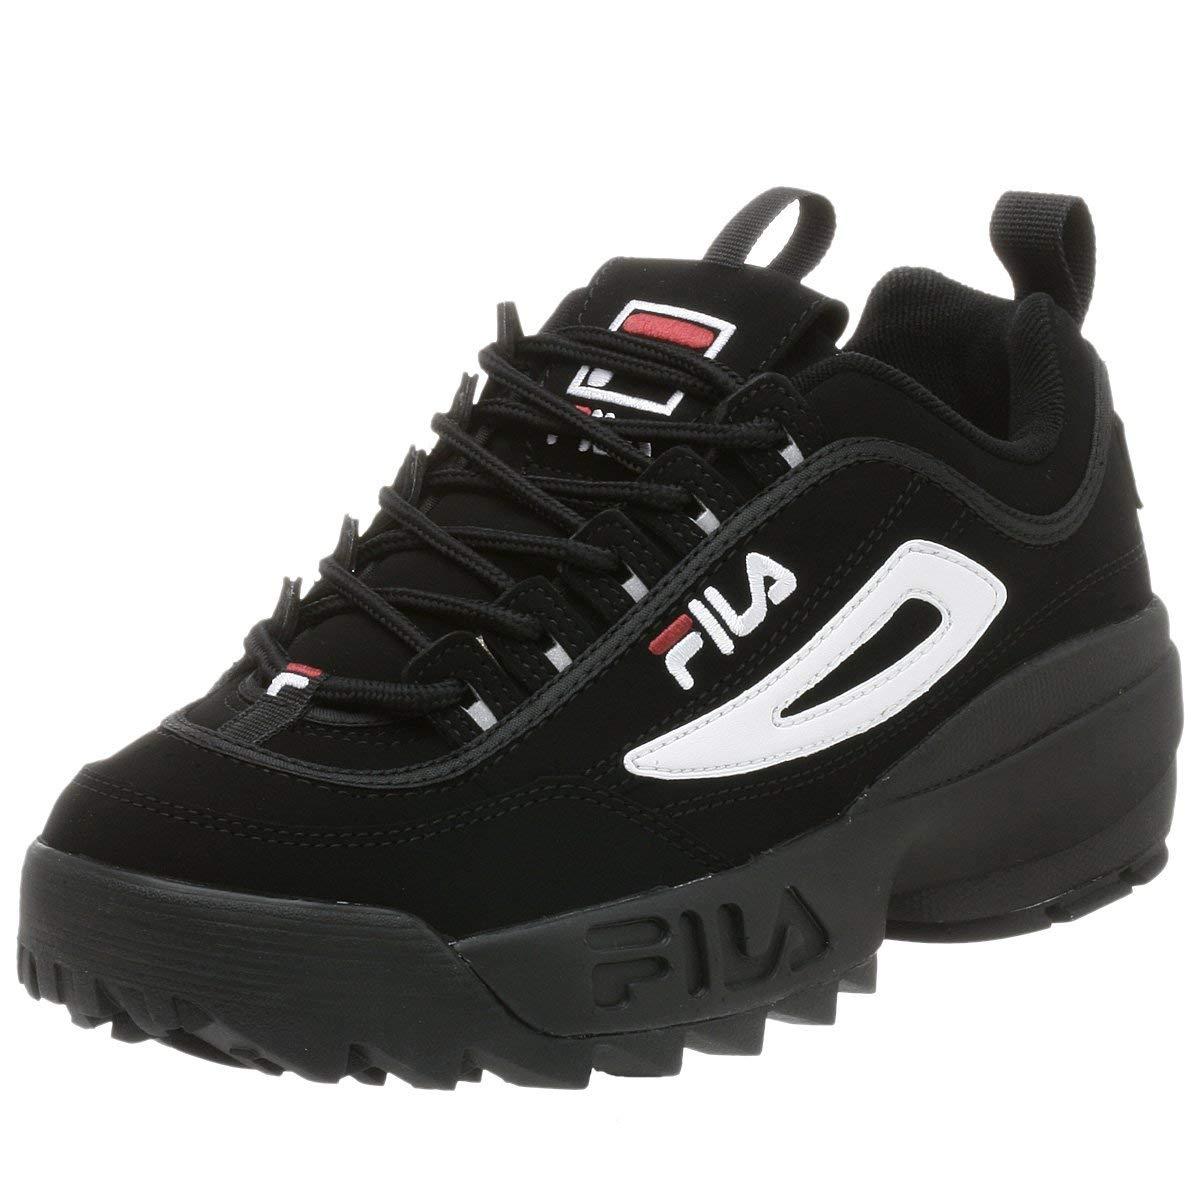 Fila Disruptor II, Men's Sneaker- Buy